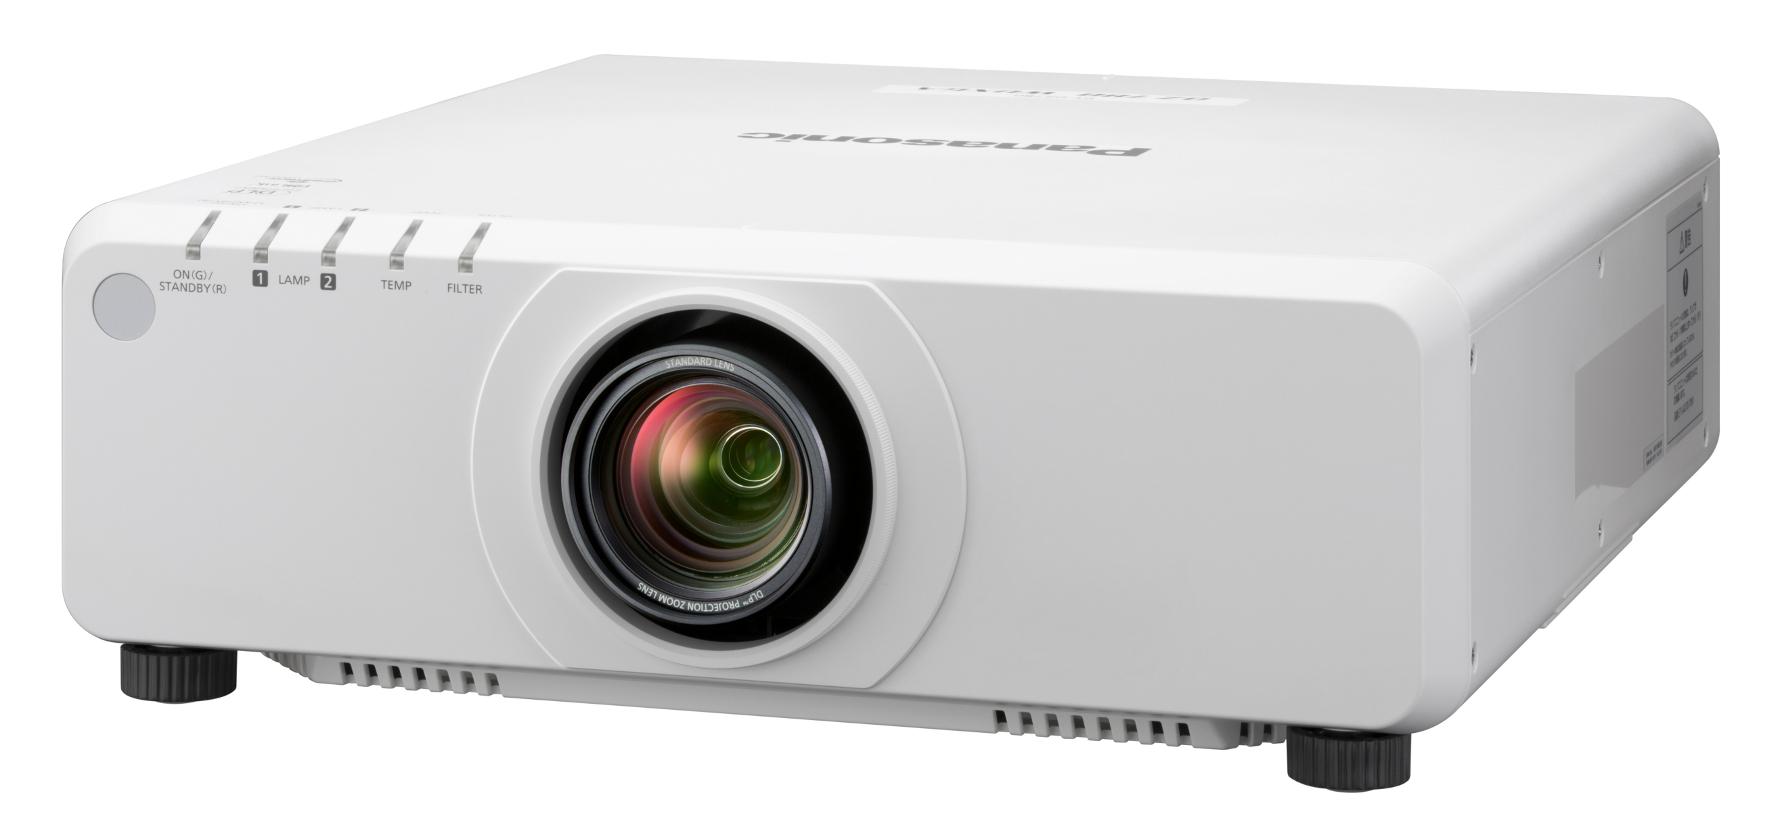 8200 Lumen WXGA 1-Chip DLP Projector with Standard Lens & DIGITAL LINK in White